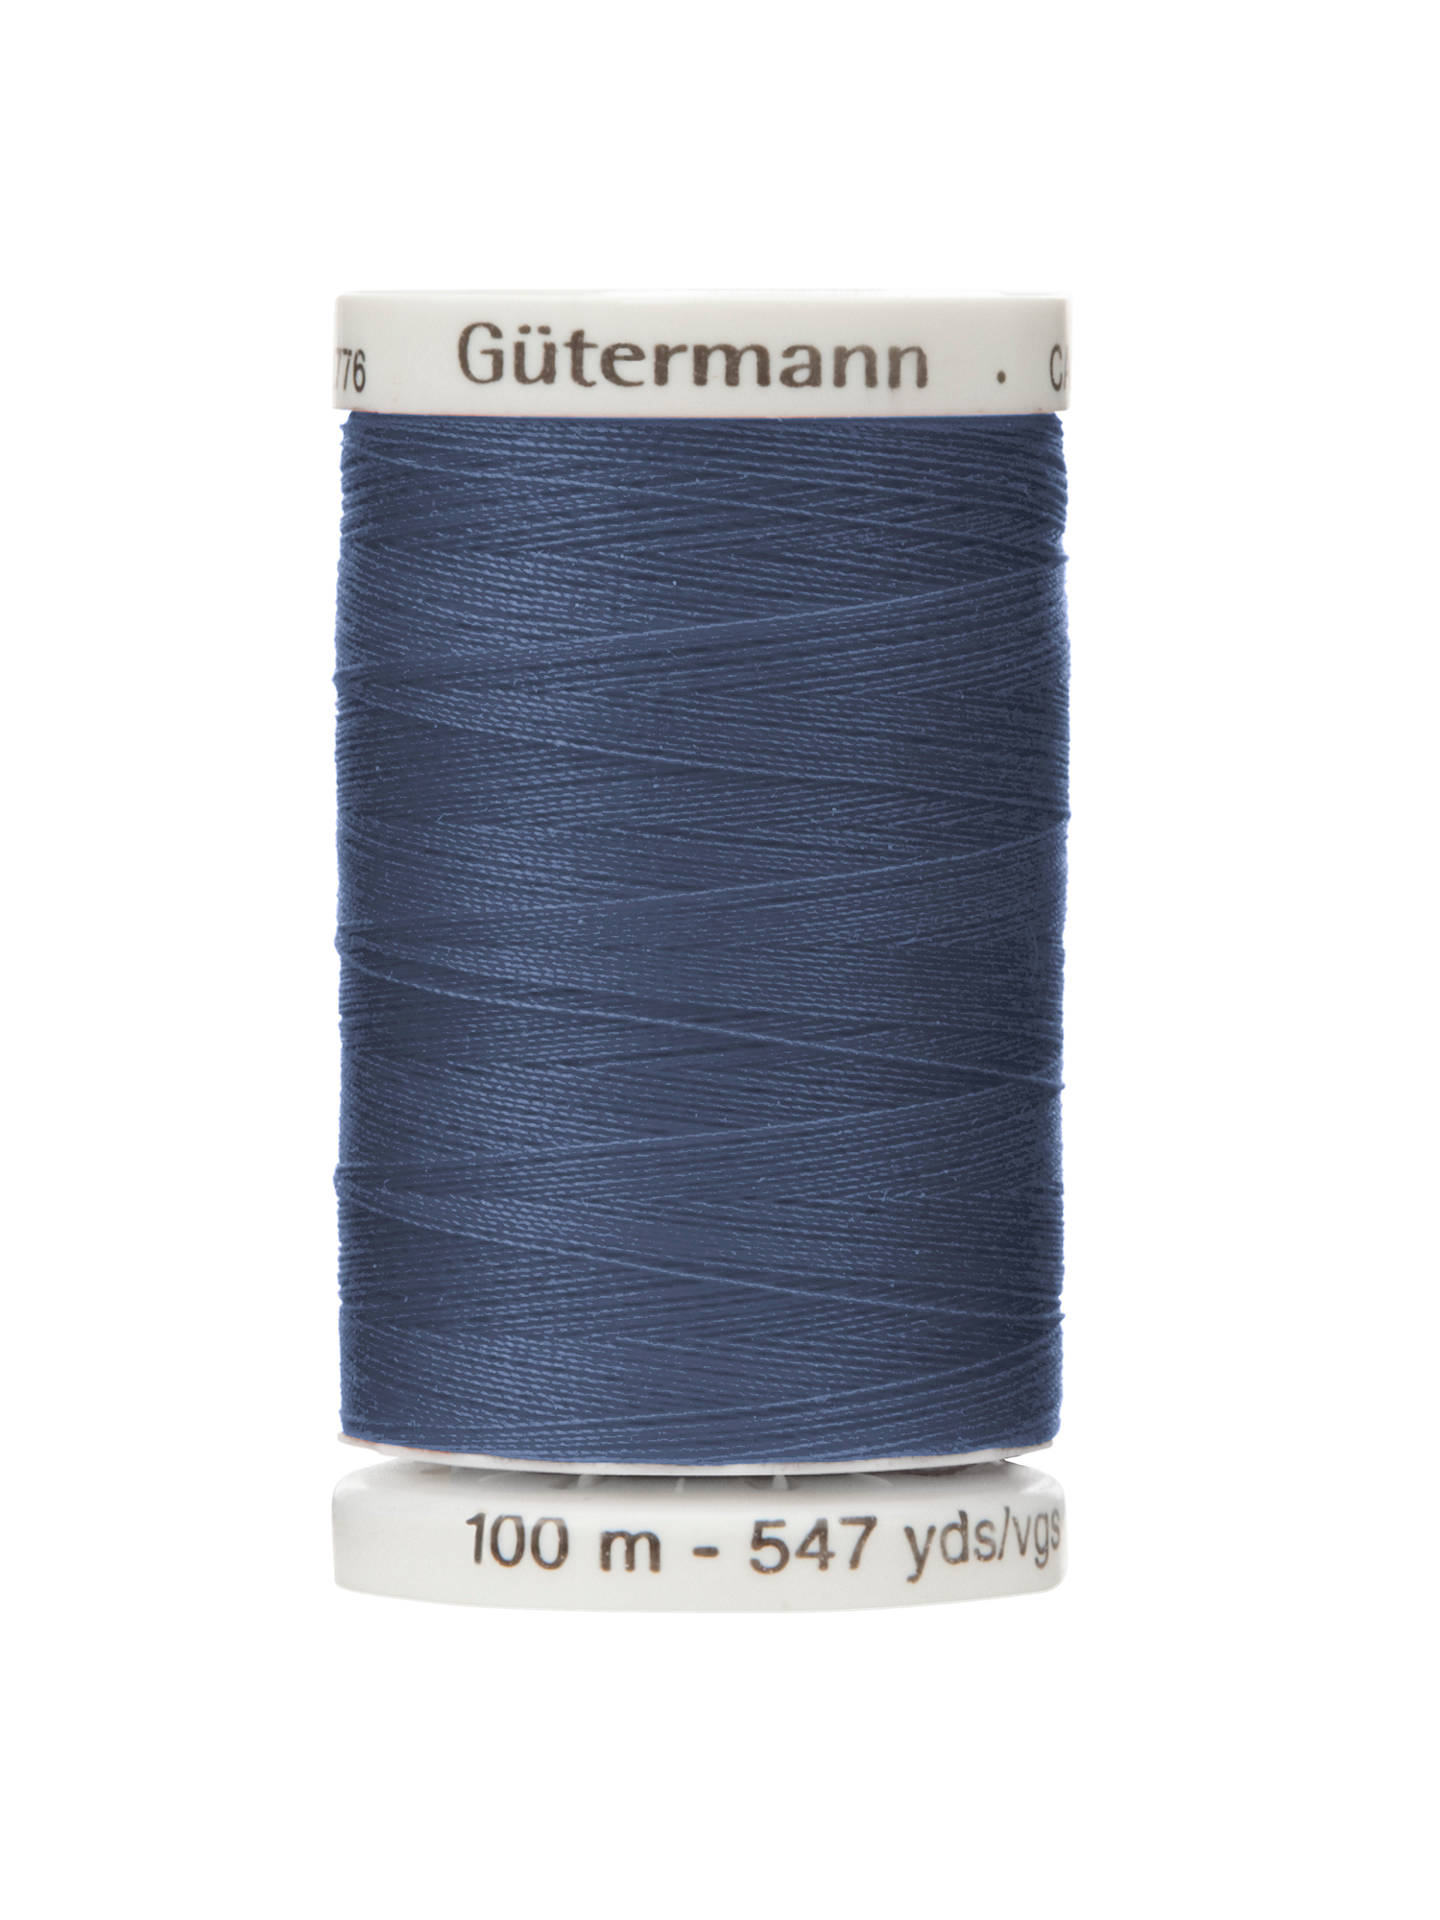 100m Gutermann Sew-all Thread 76